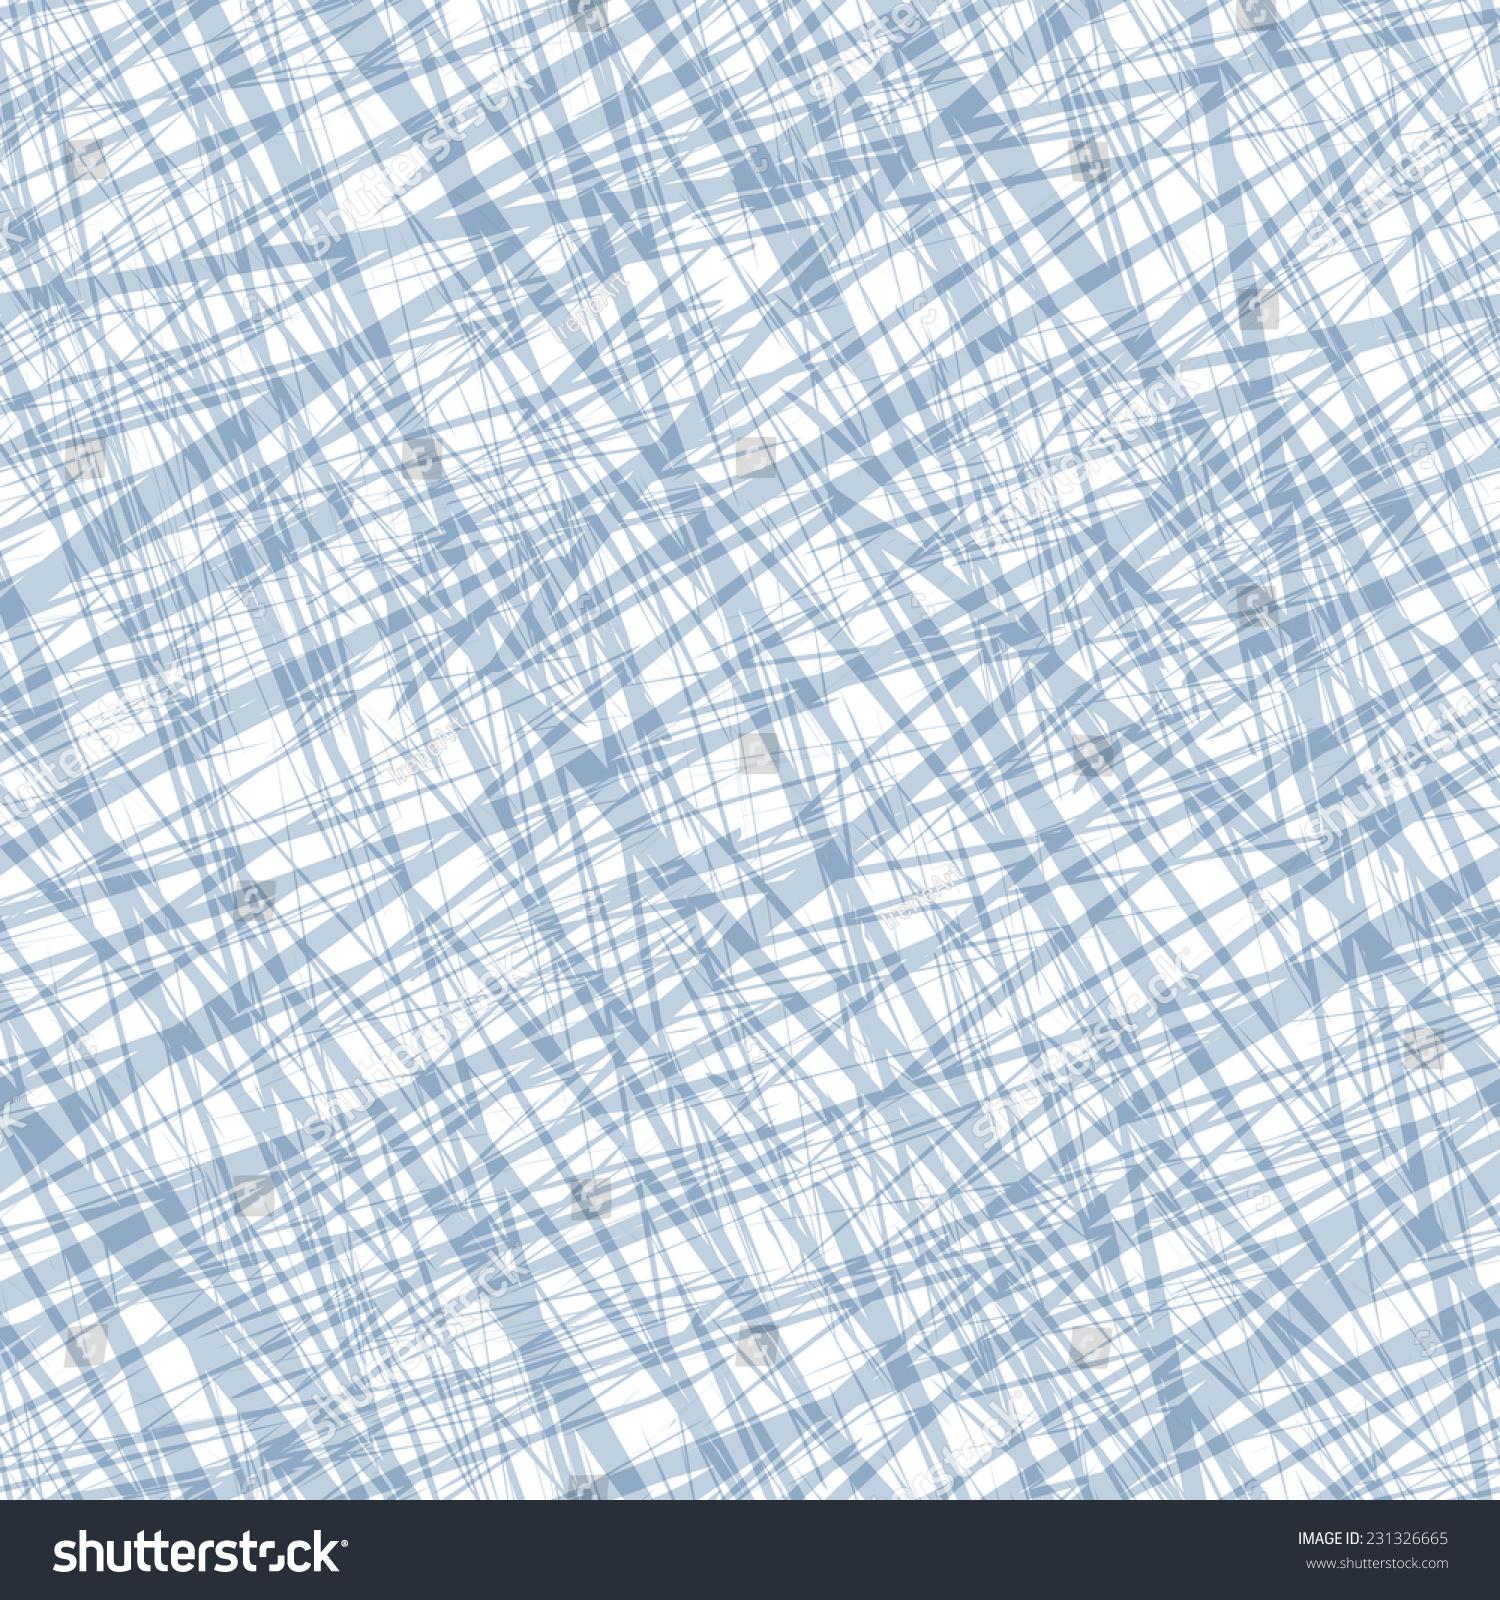 Line Texture Seamless : Seamless pattern random cross lines texture stock vector